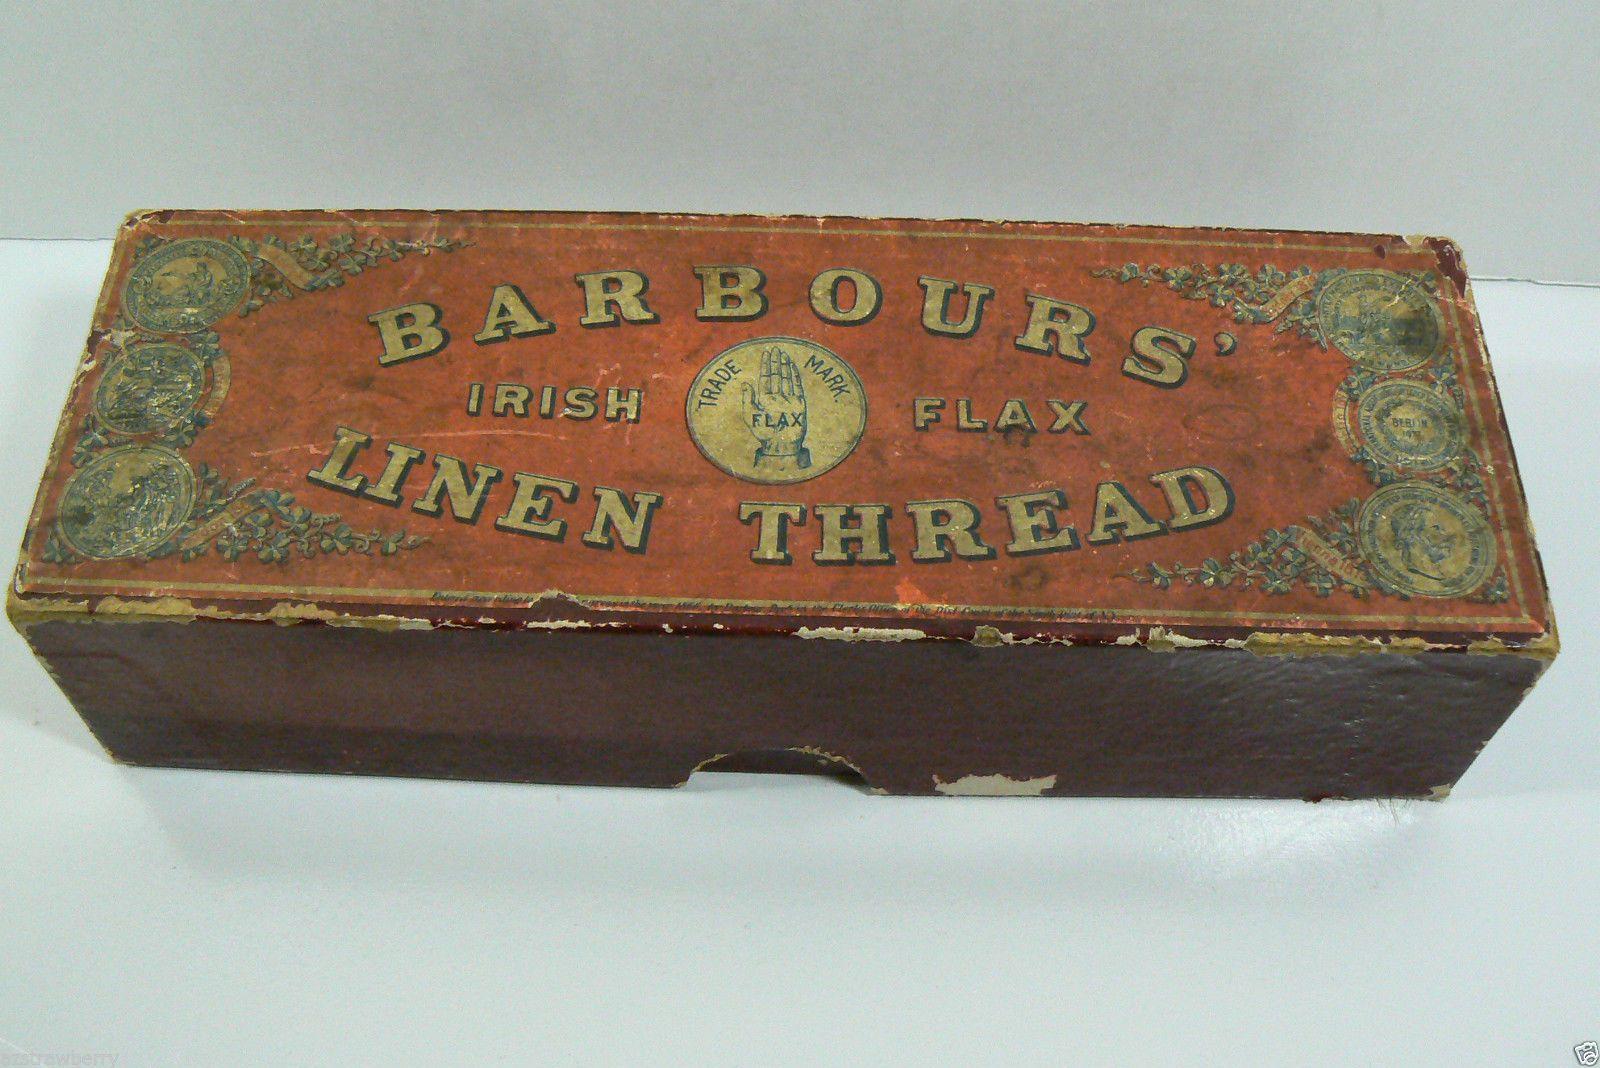 Barbour's Irish Flax Linen Thread Cardboard Box 1866 Old